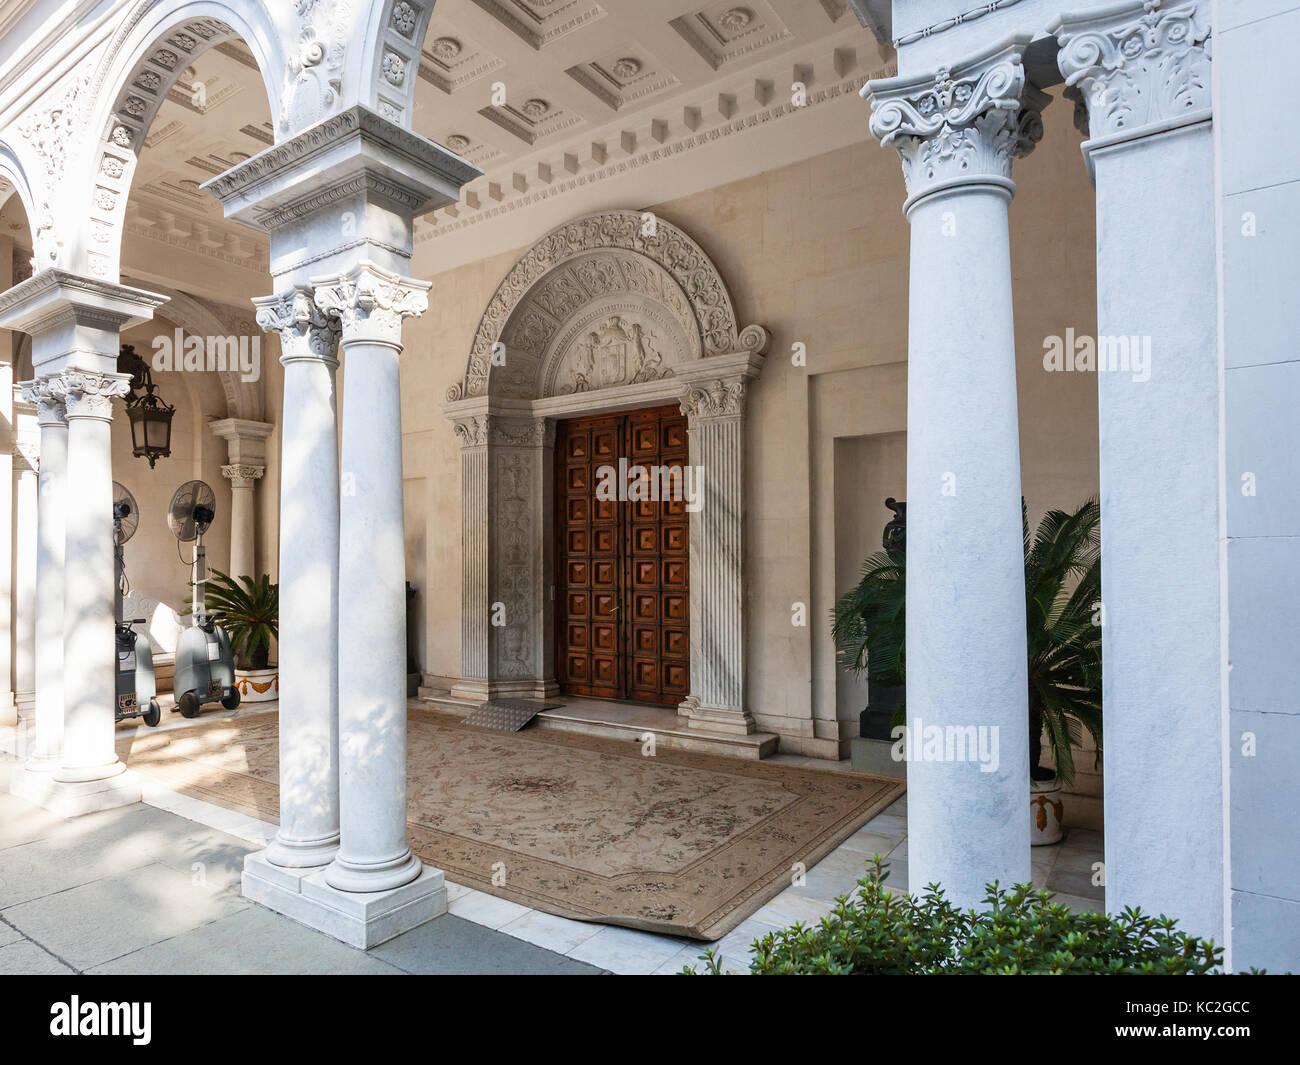 LIVADIYA, CRIMEA - SEPTEMBER 21, 2017: entrance to Livadia Palace. The palace was the summer residence of the Russian - Stock Image